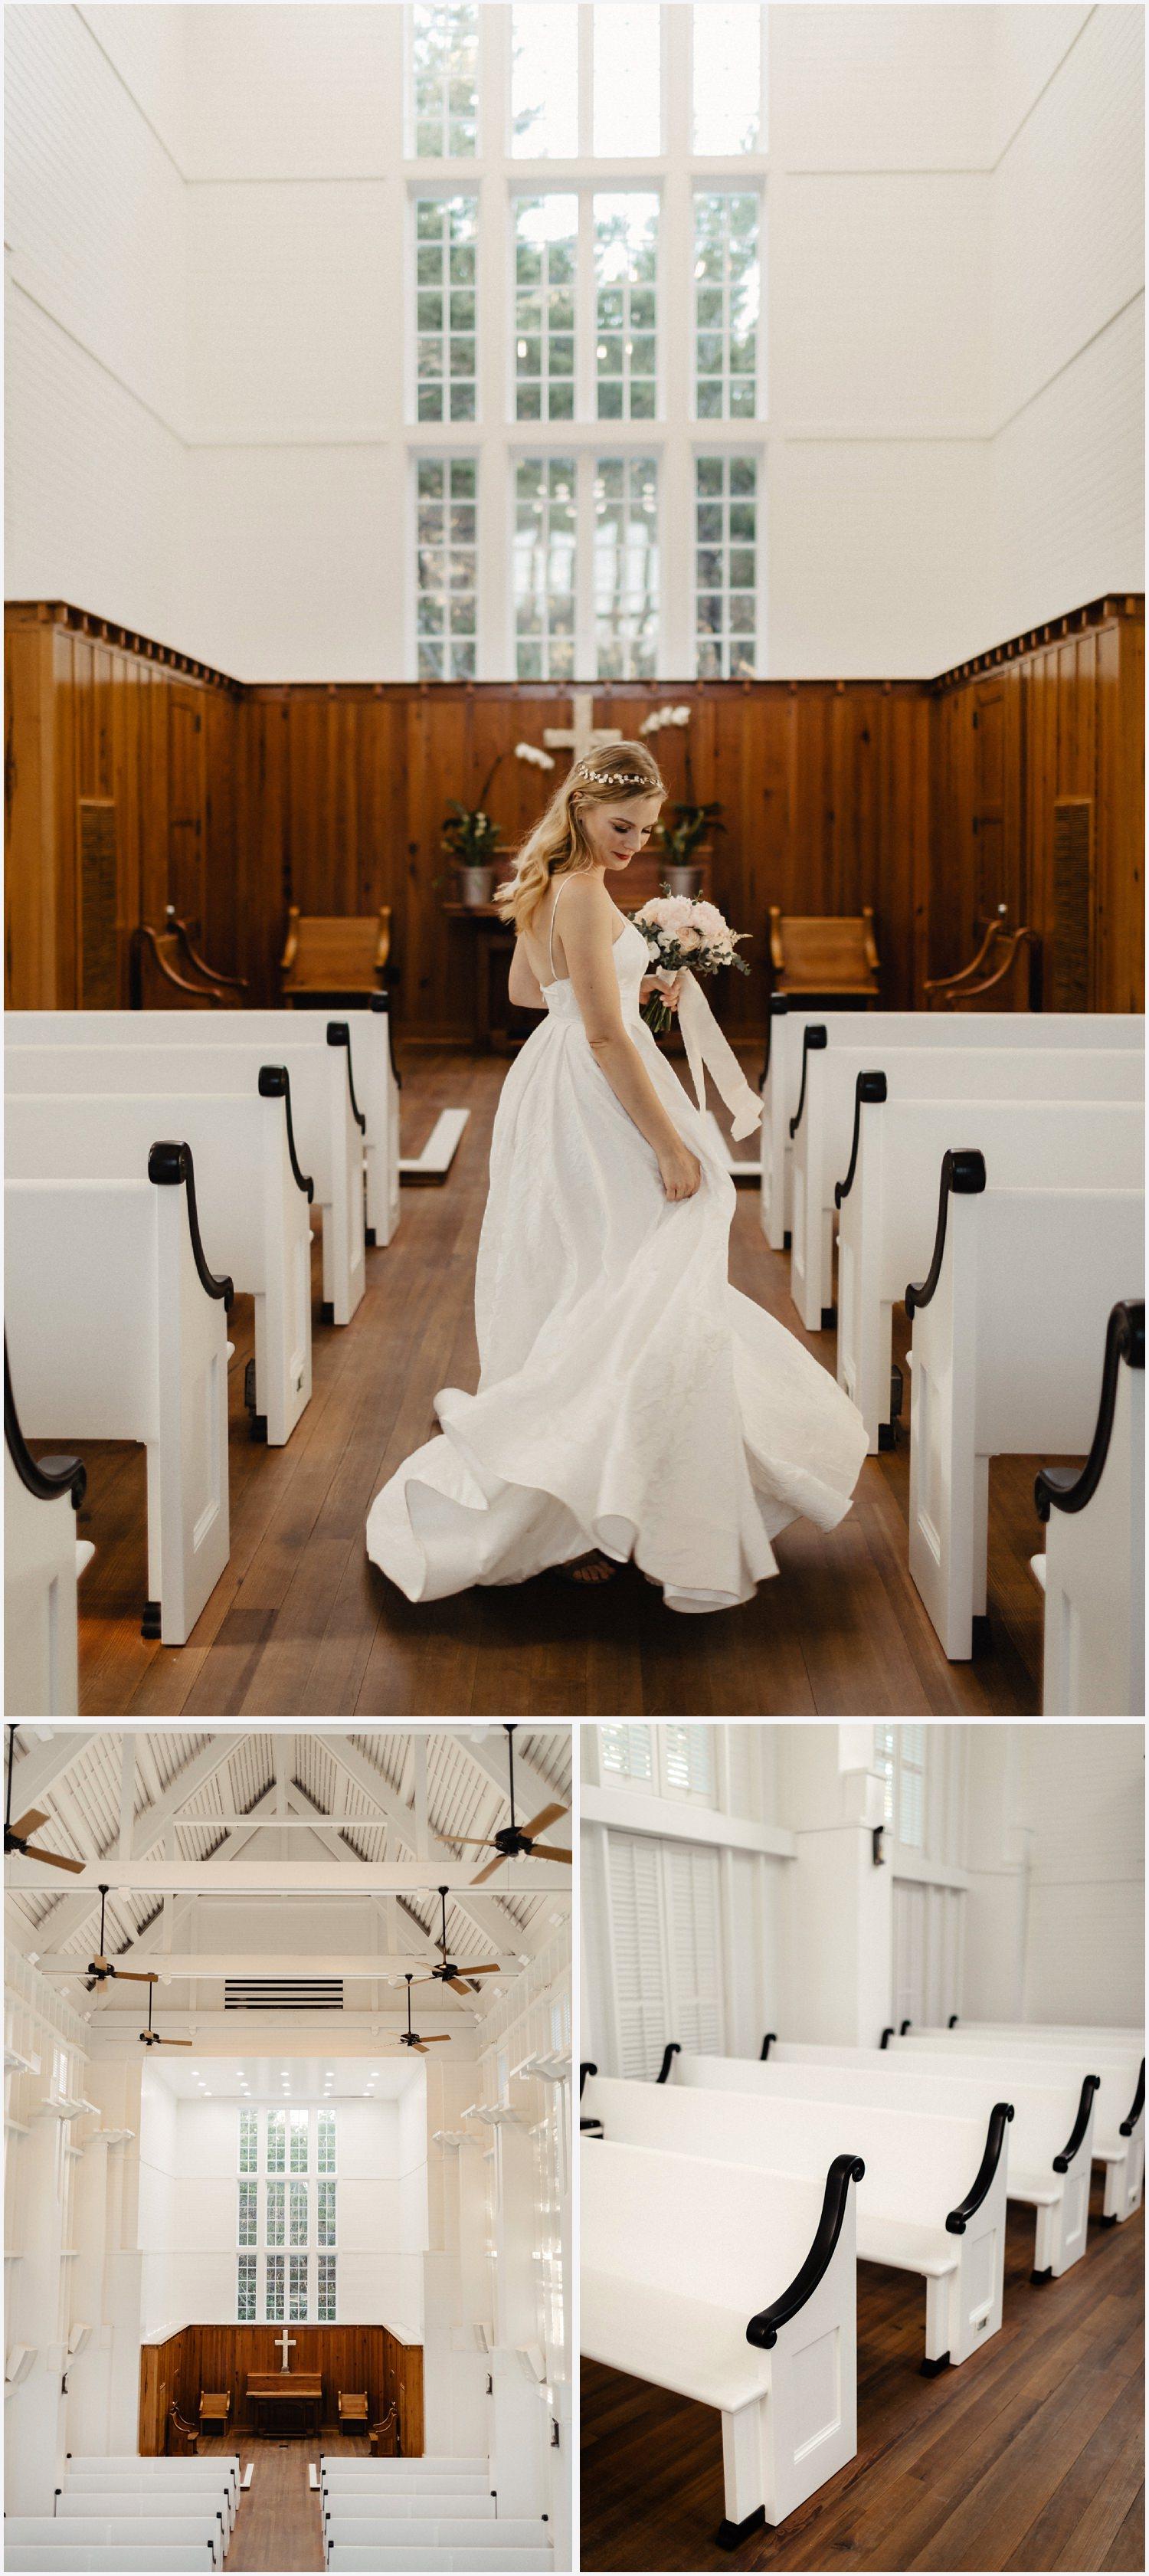 Bride dancing in the Seaside Chapel